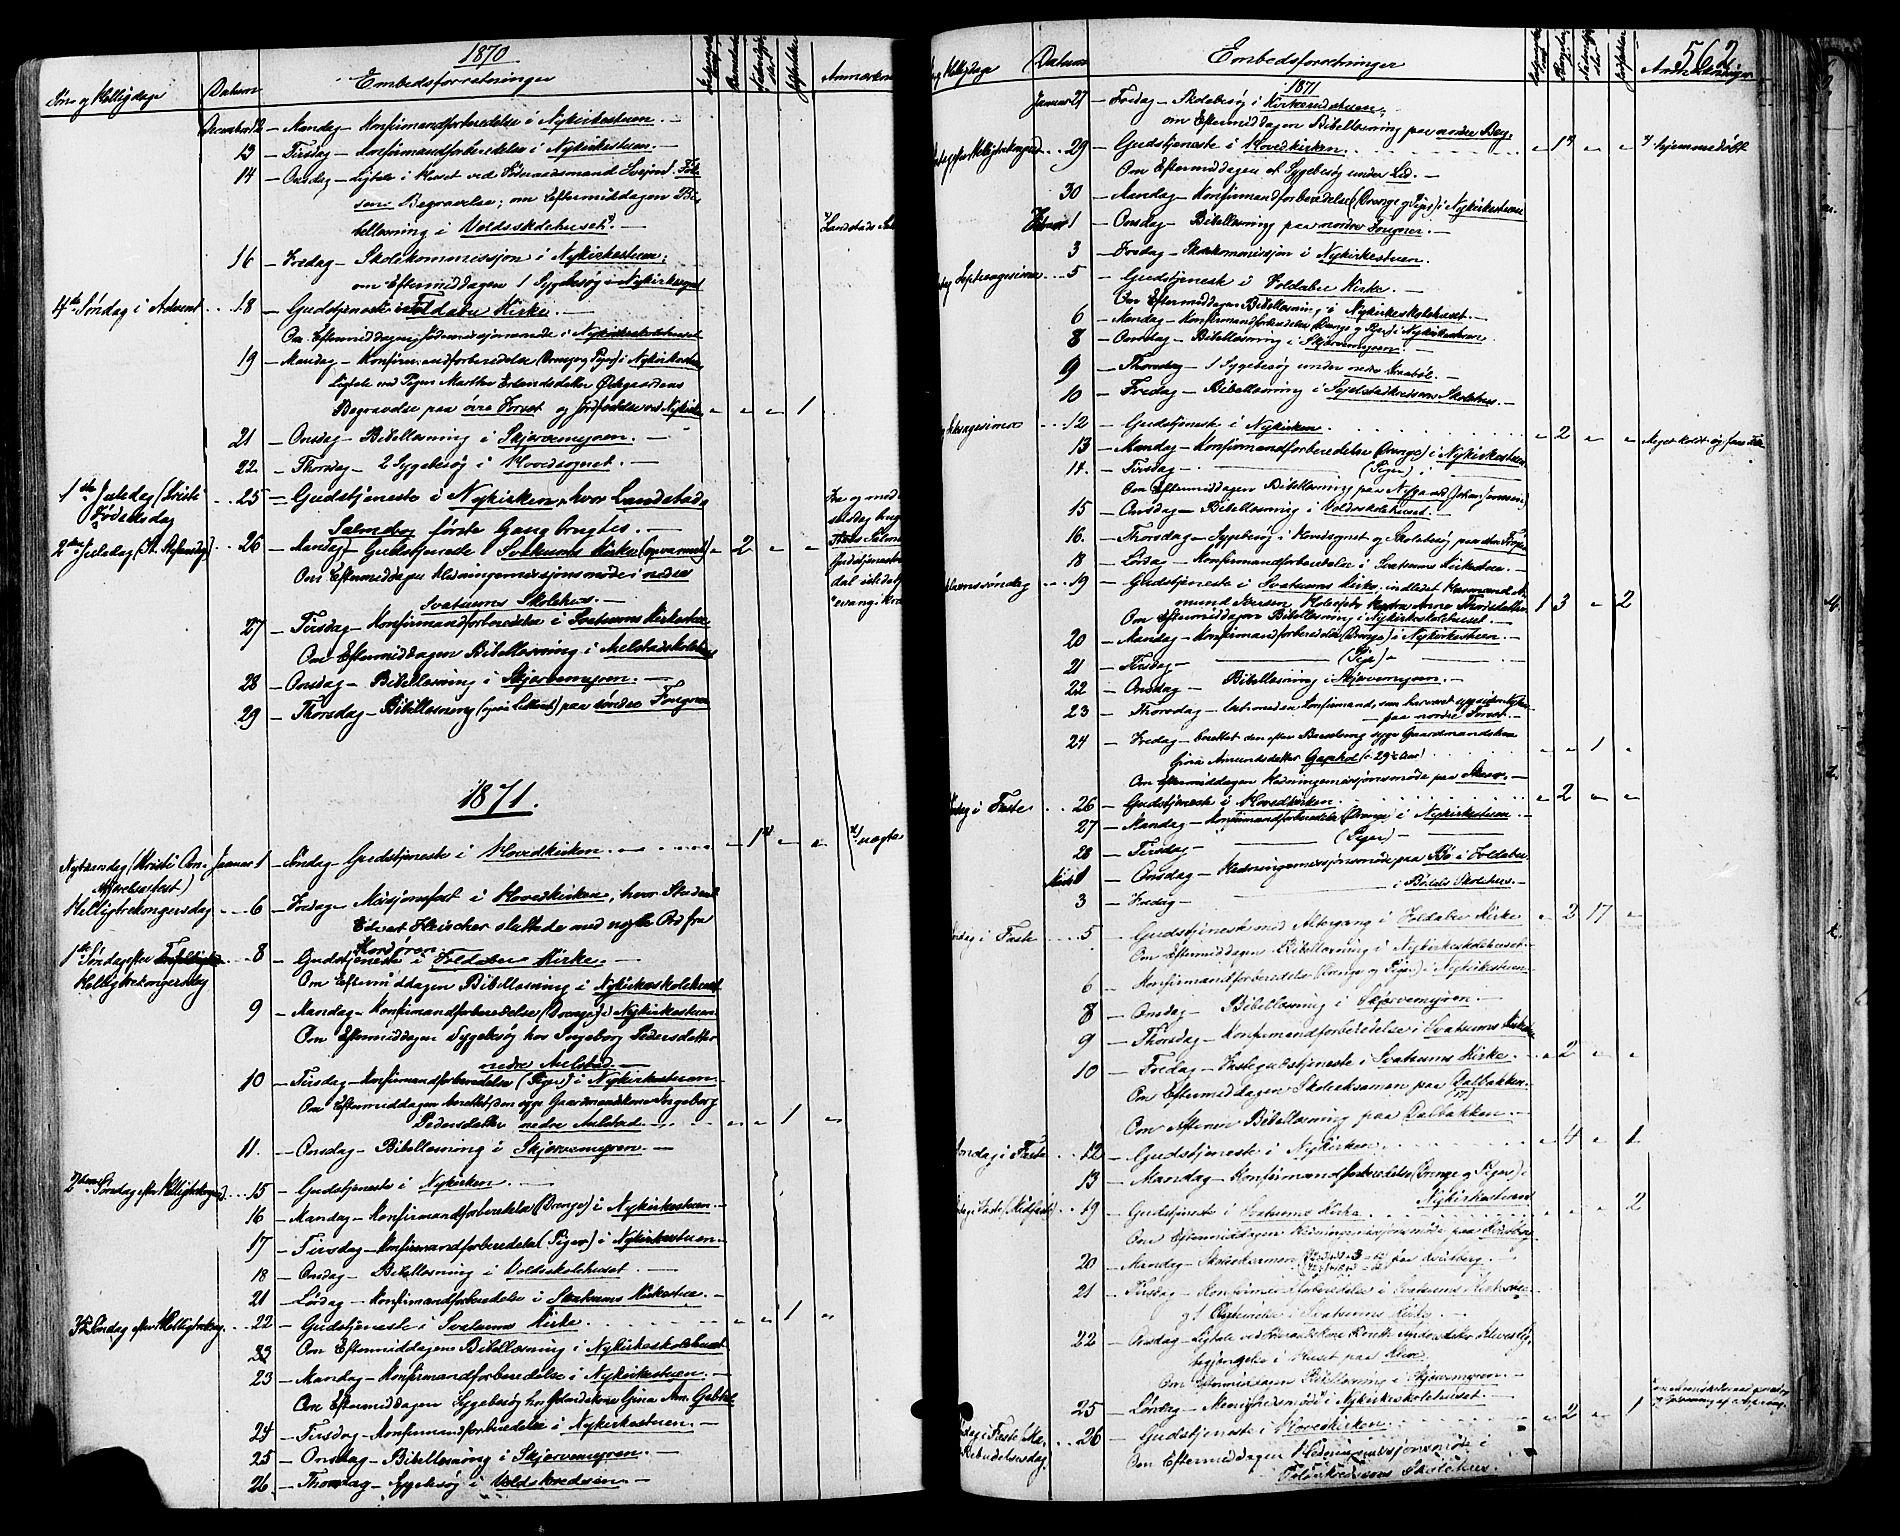 SAH, Gausdal prestekontor, Ministerialbok nr. 10, 1867-1886, s. 562